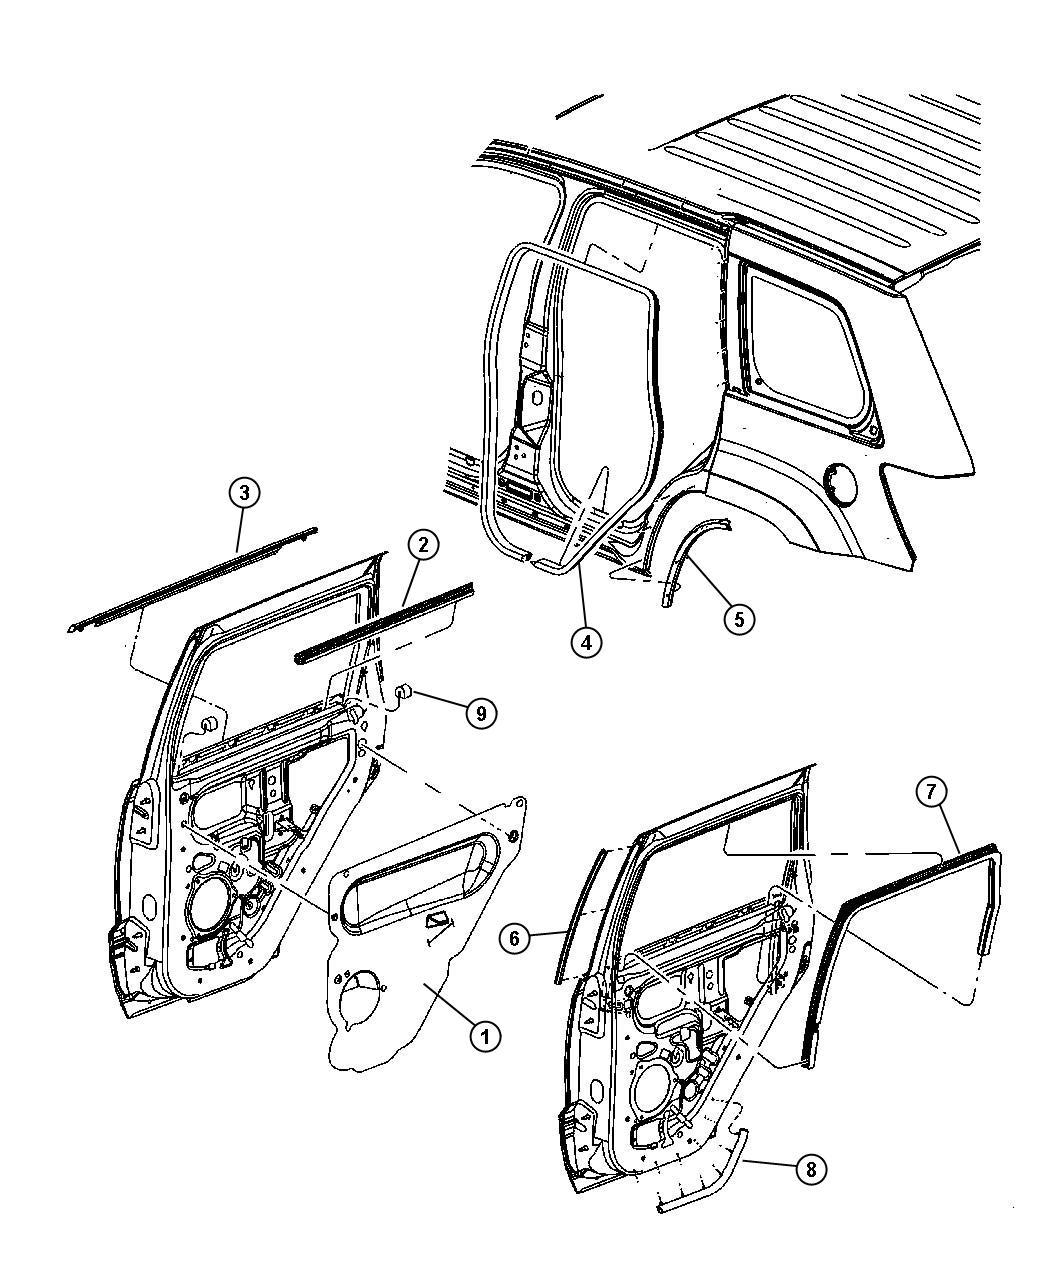 Jeep Grand Cherokee Seal Wheelhouse Right Cutline